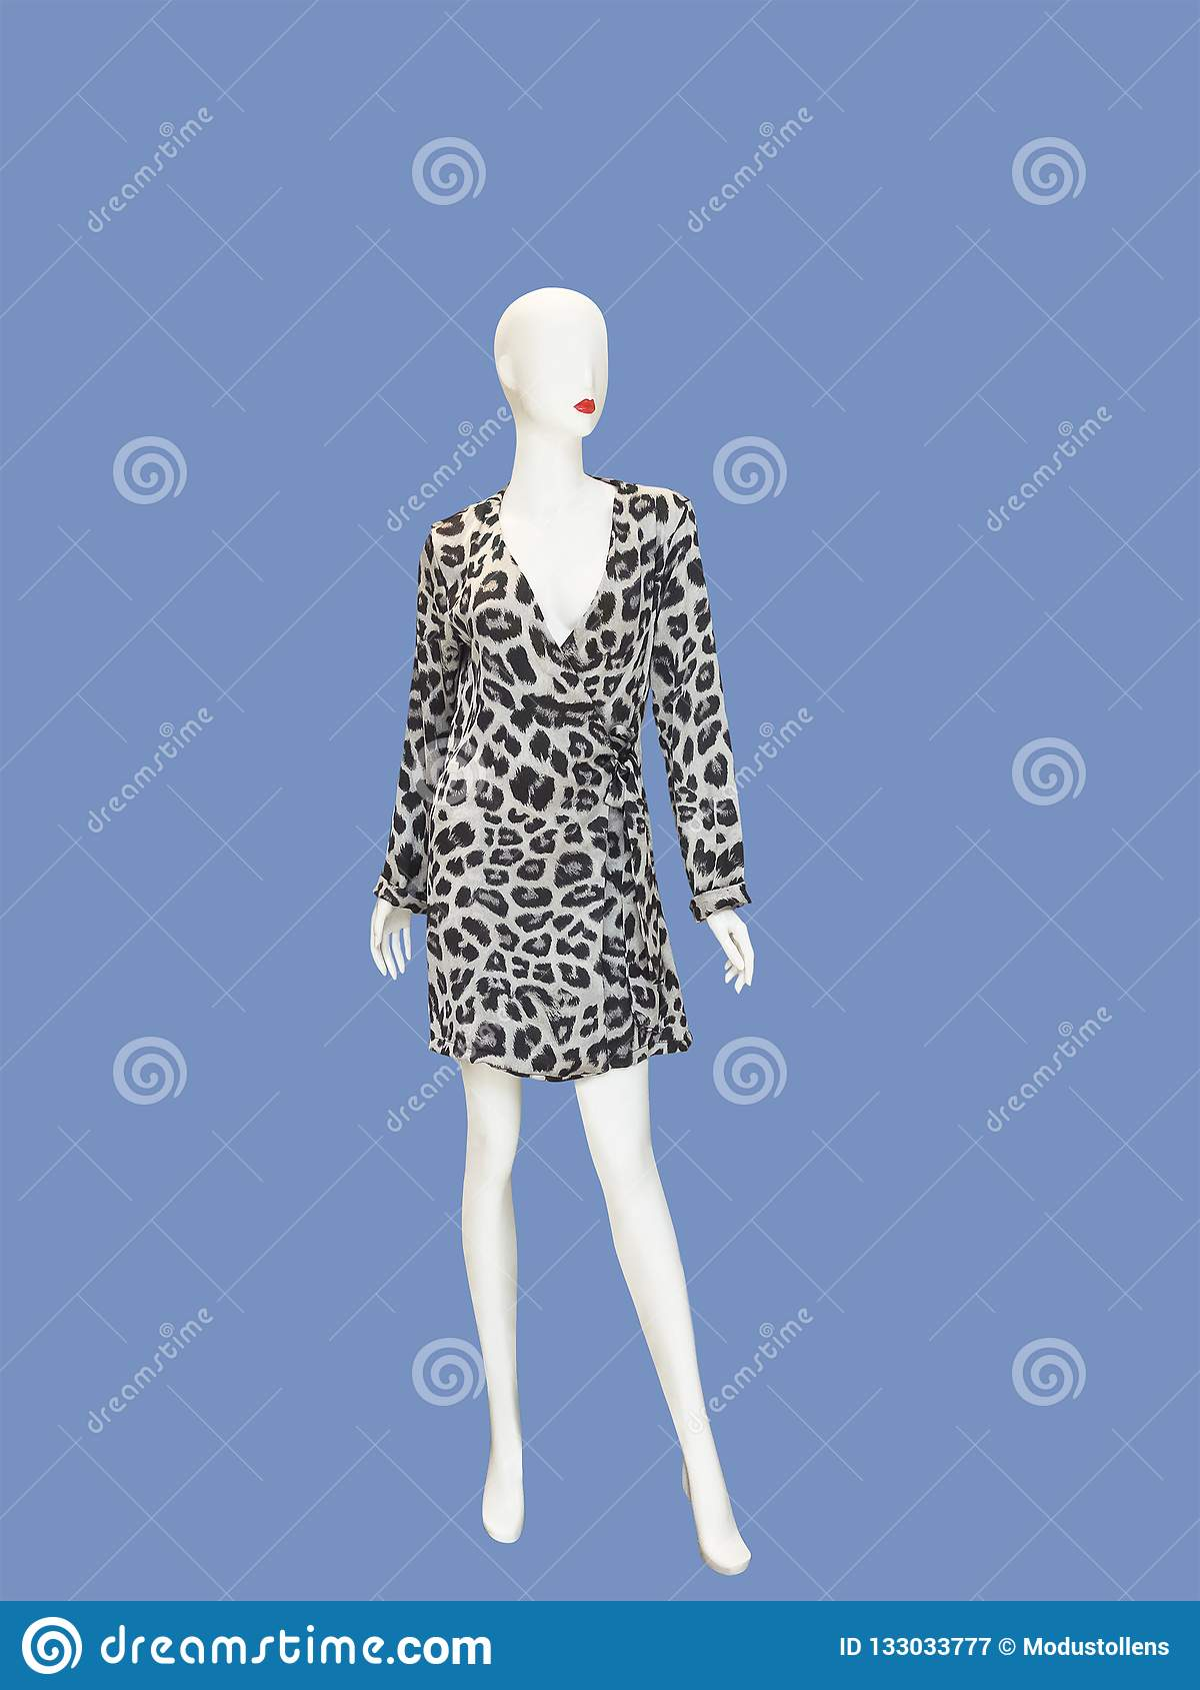 Full-length Female Mannequin Stock Image - Image of isolated